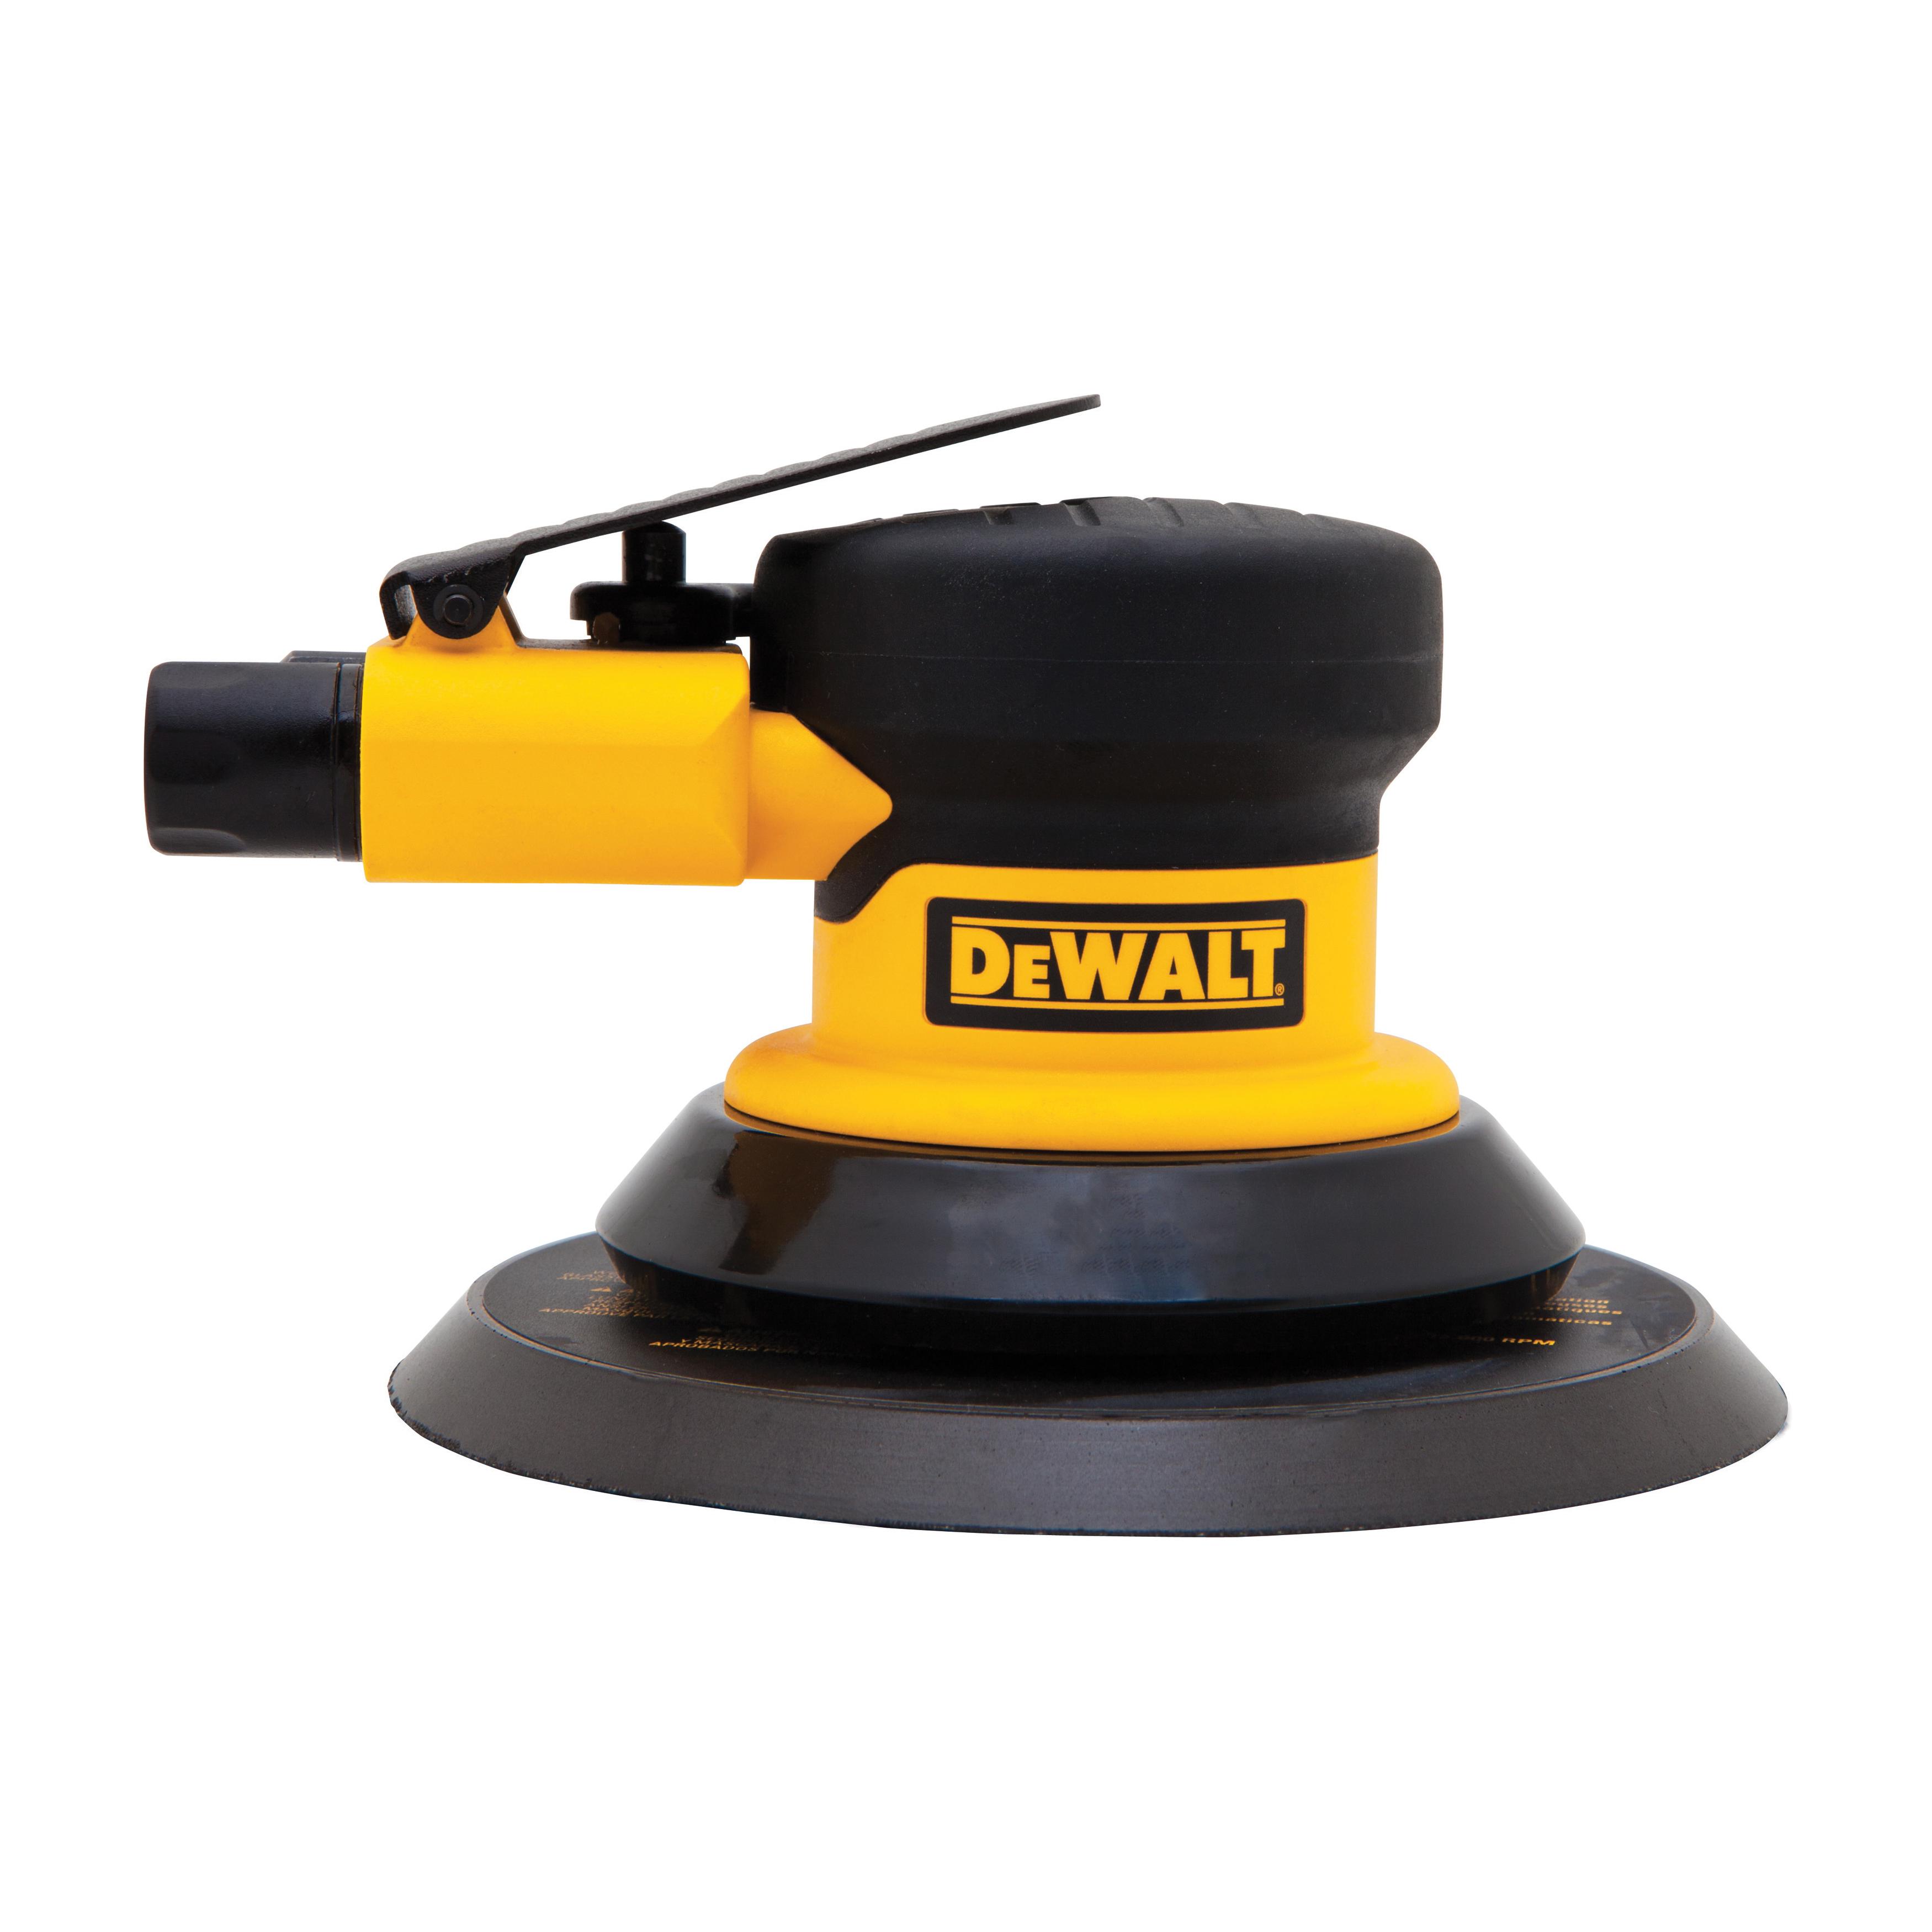 DeWALT® DWMT70781L Palm Pneumatic Disc Sander, 6 in Dia Disc, 3/32 in Arbor/Shank, 2.2 cfm Air Flow, 90 psi